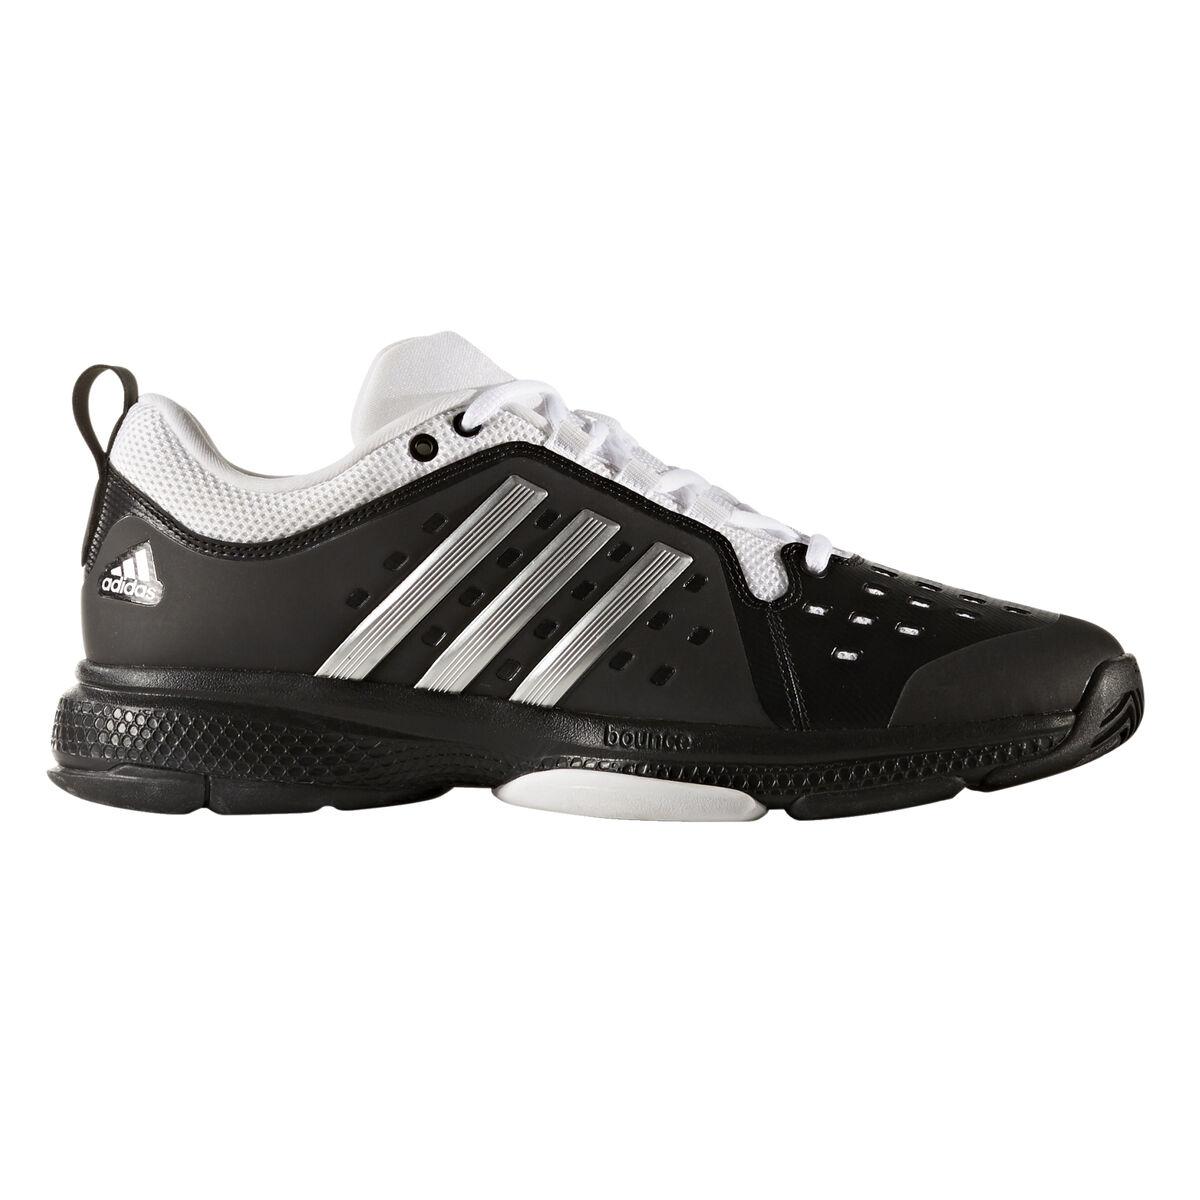 hot sale online dccf2 dc63f Images. adidas Barricade Classic Bounce Men  39 s Tennis Shoe - Black Silver